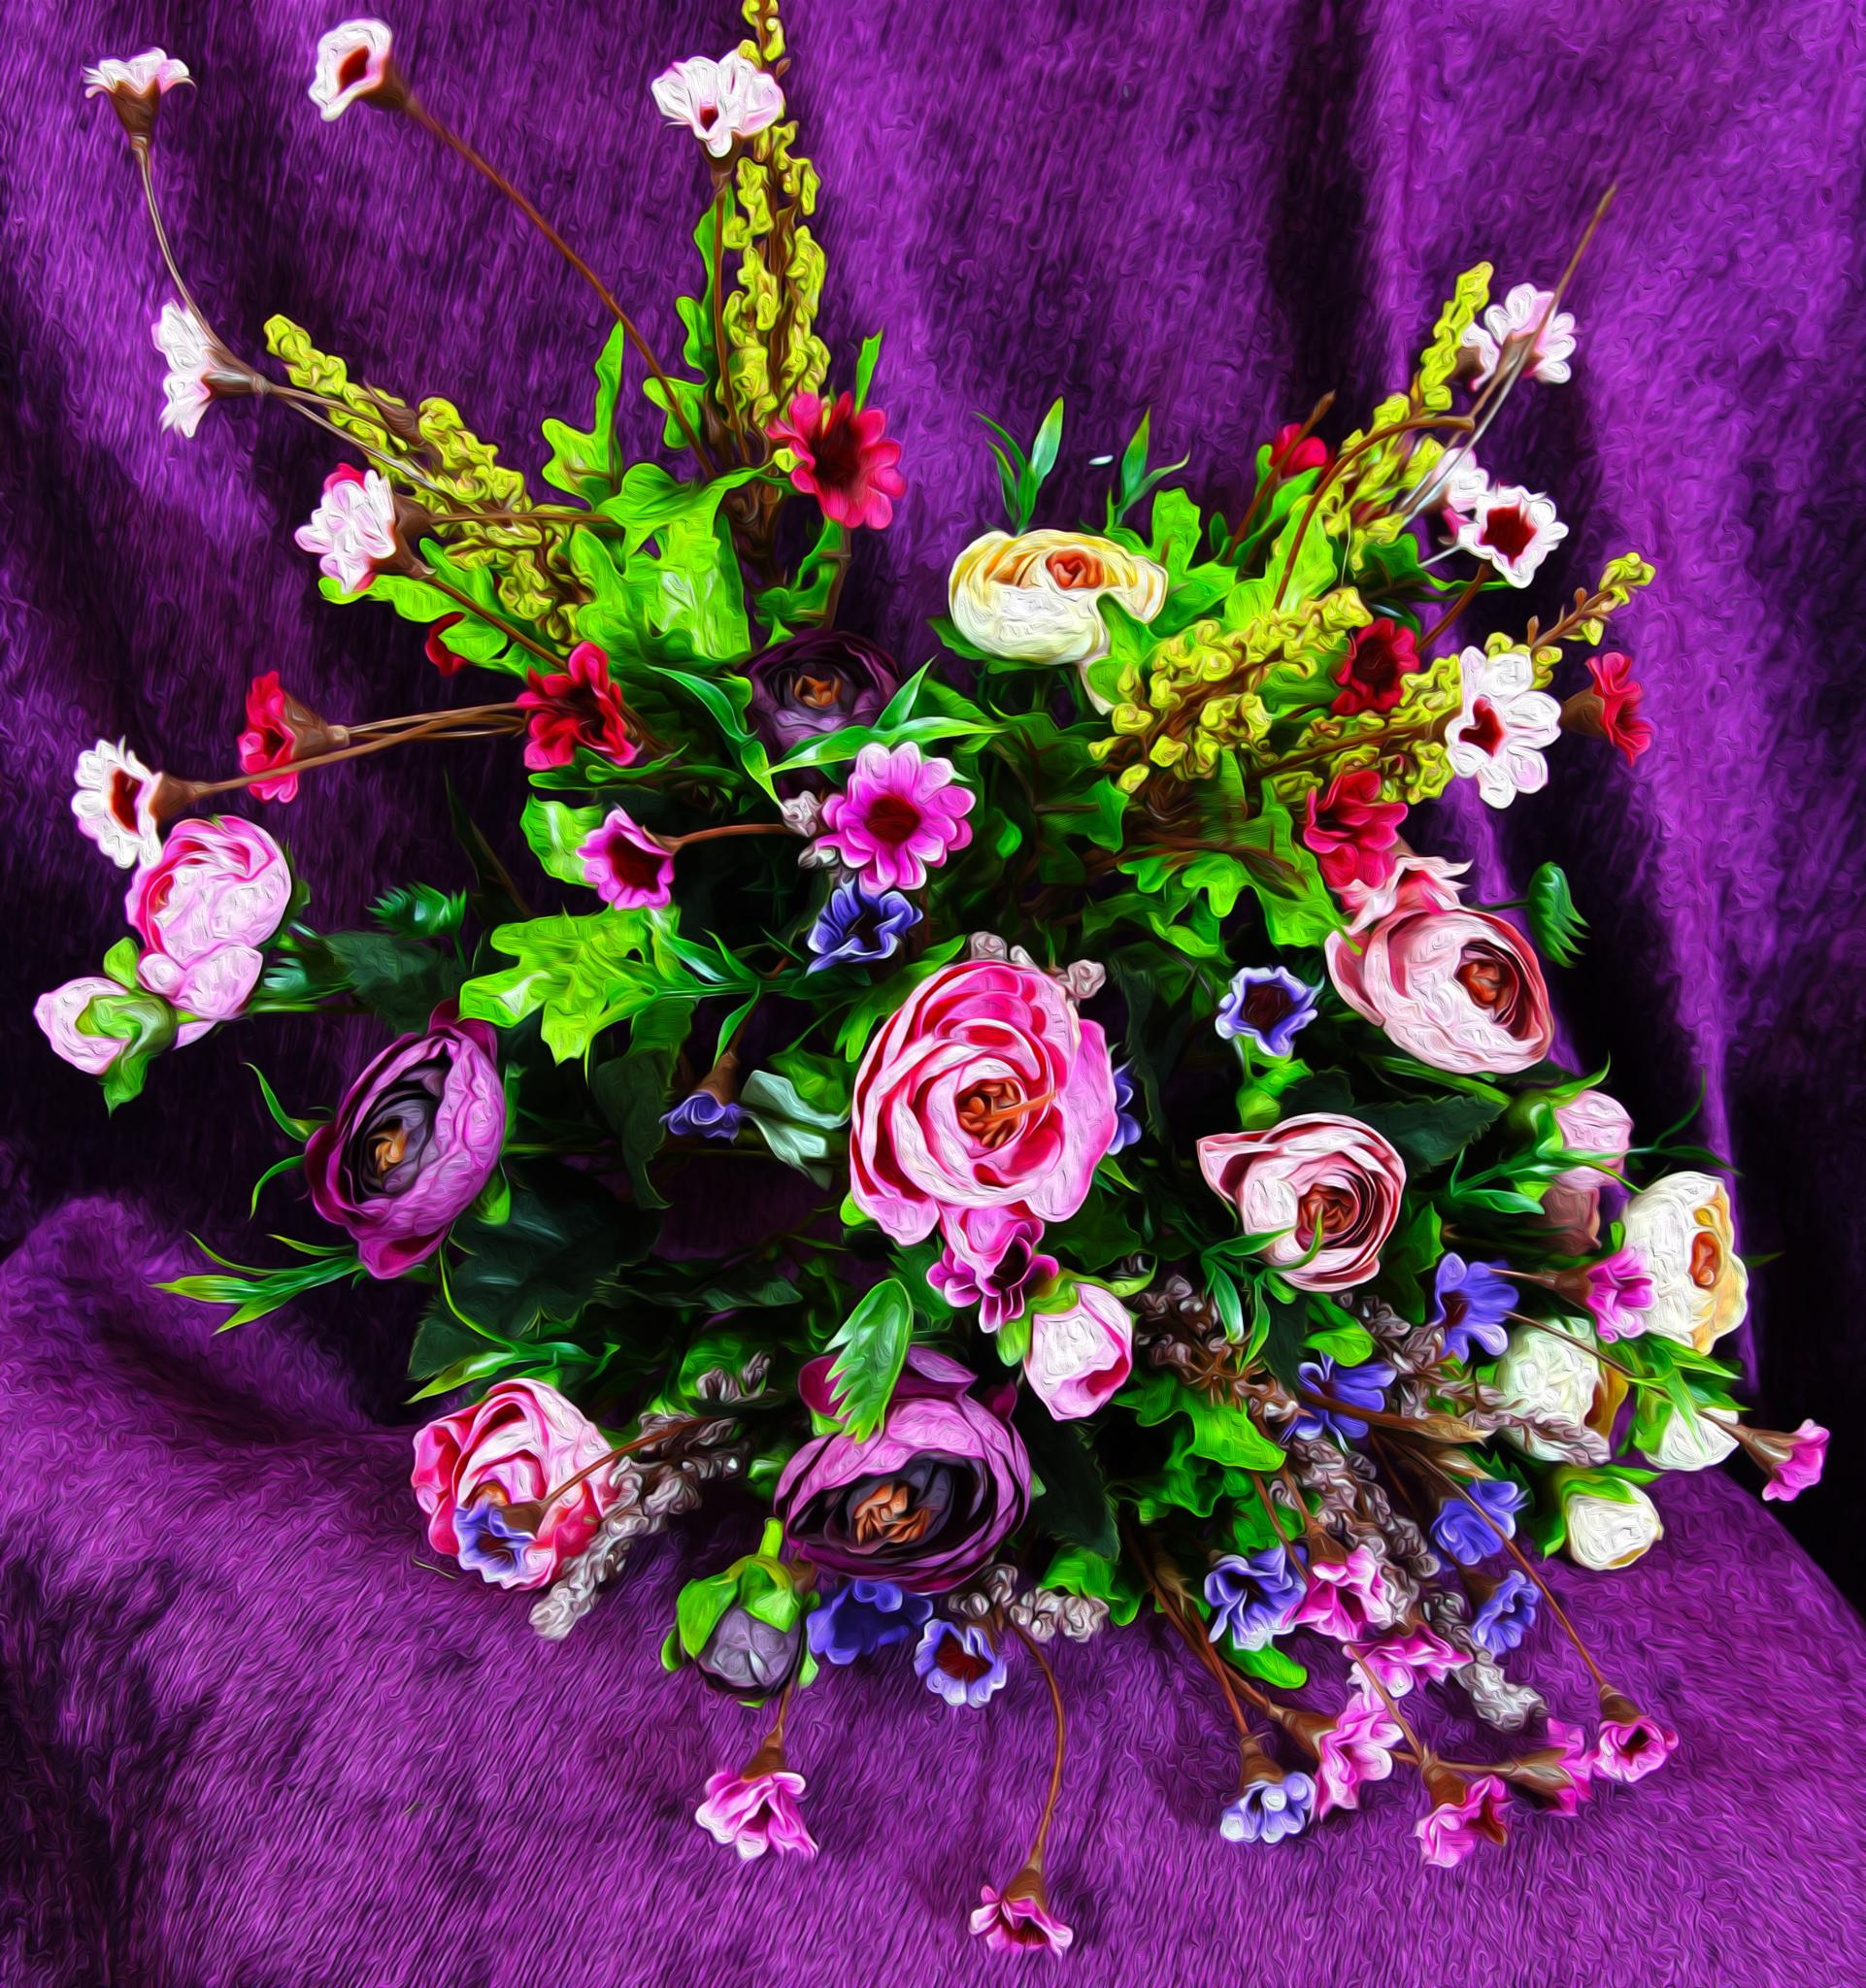 flower by handanoran01